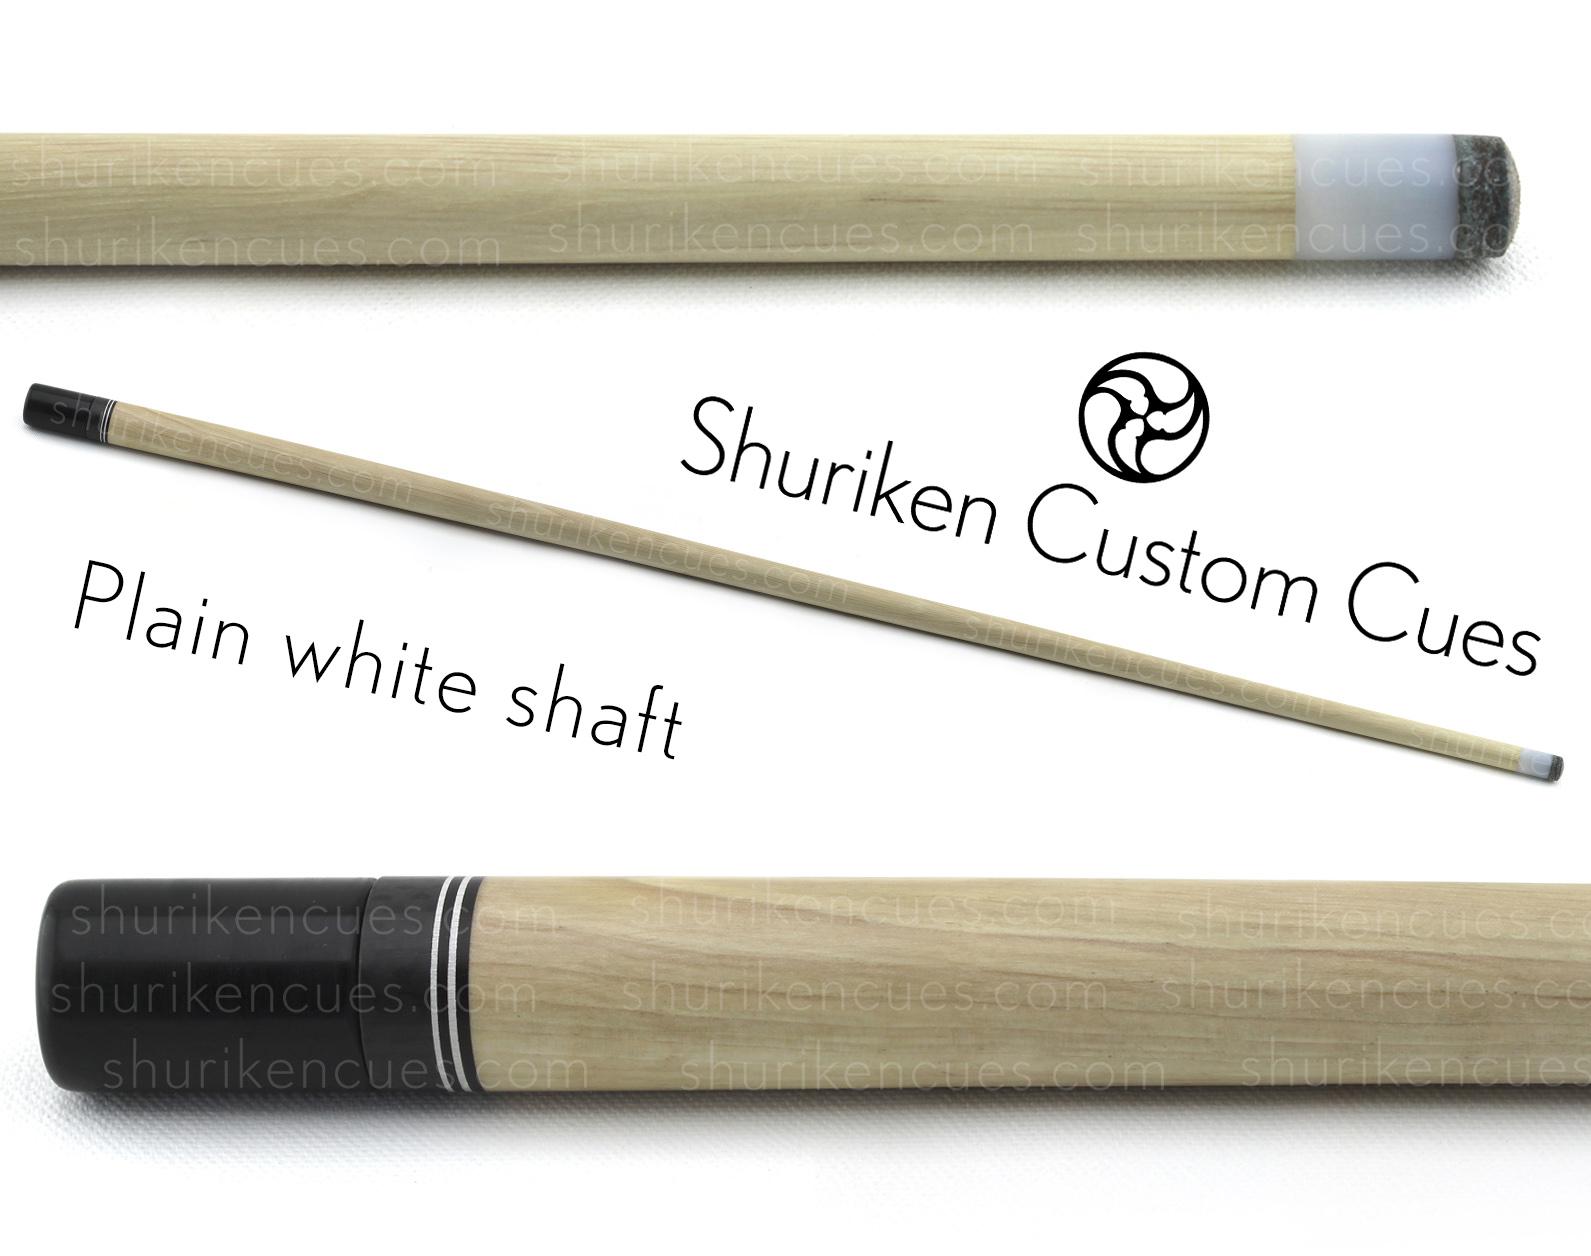 white shaft